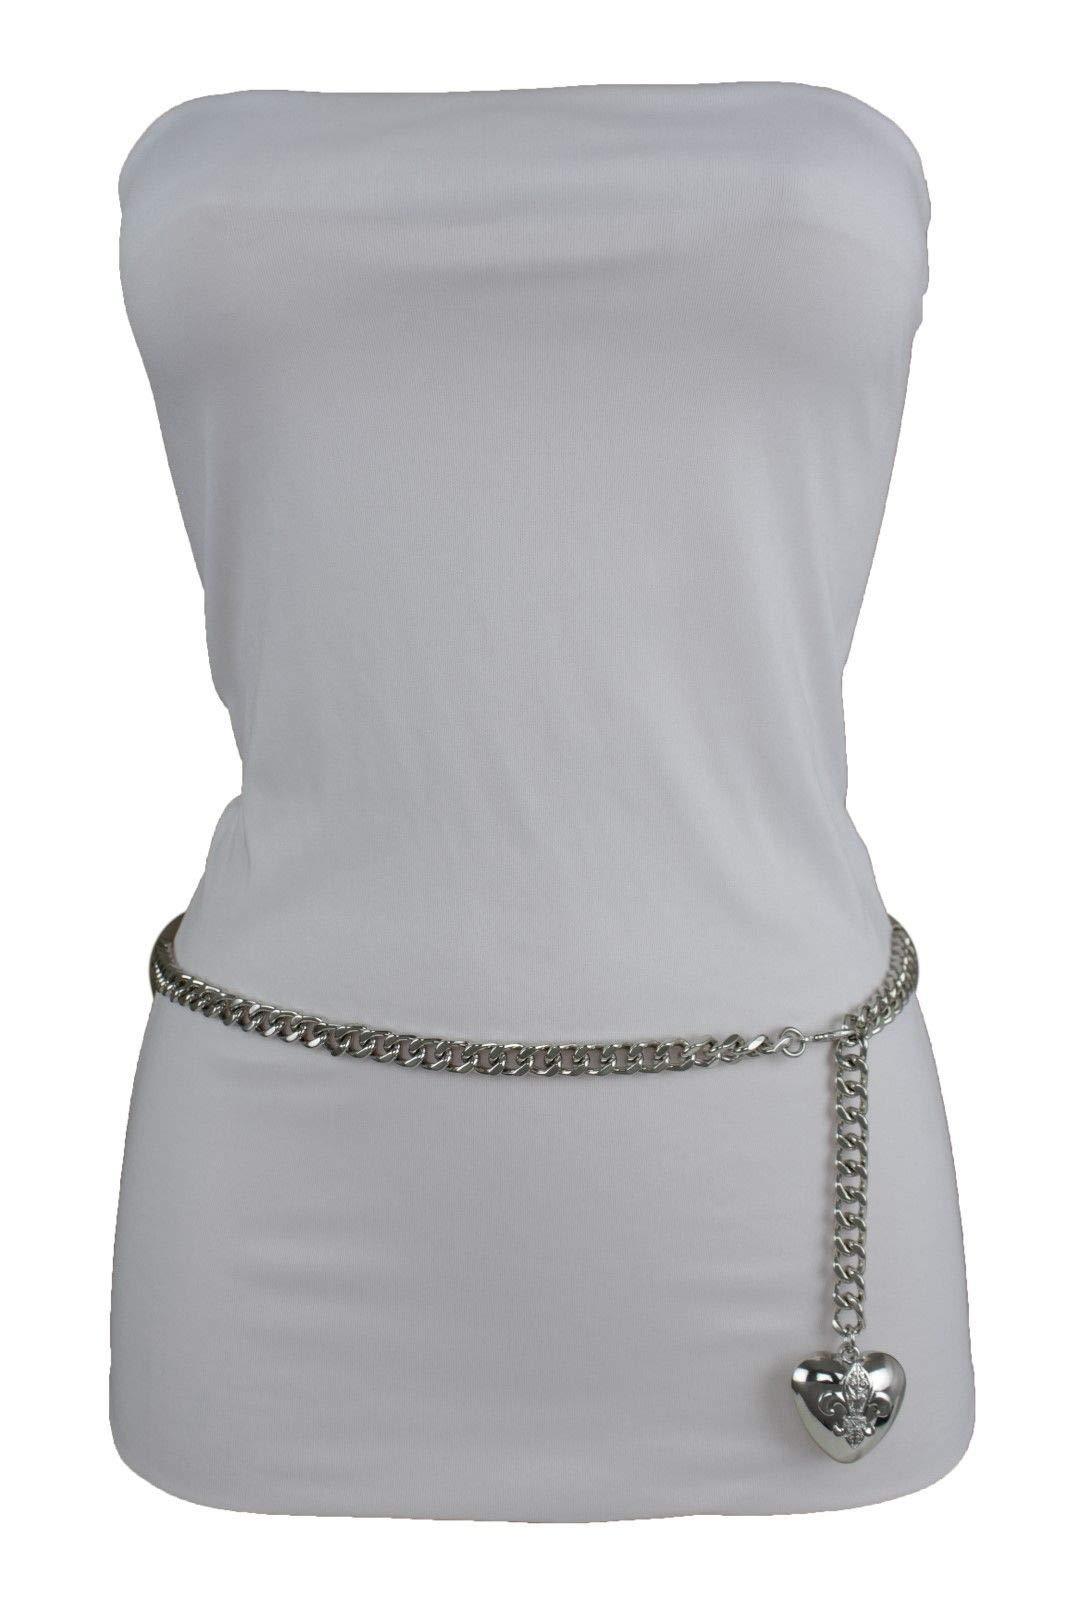 Women Hip Waist Silver Metal Chain Fashion Belt Love Heart Buckle Charm XS S M by RIX Fashion Luxury (Image #8)